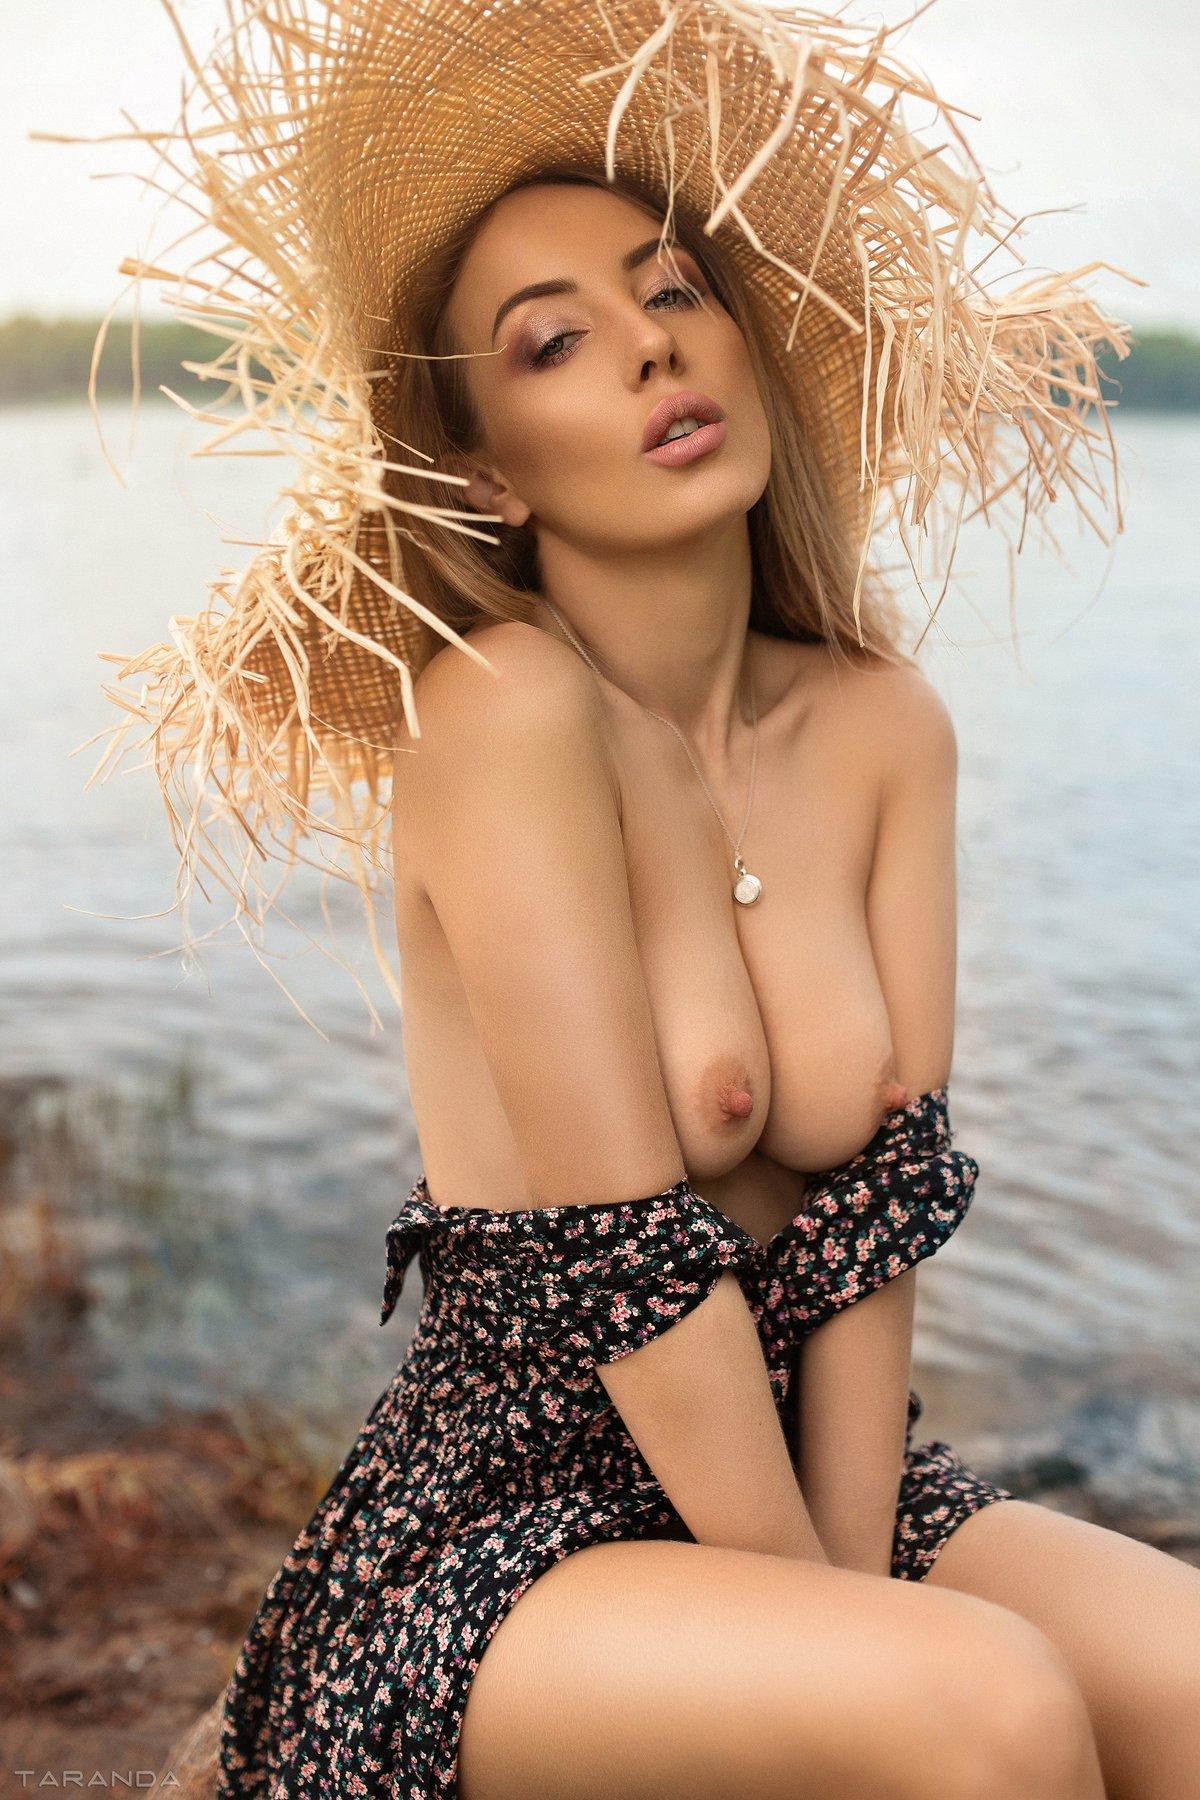 girl, kiev, ukraine, village, portrait, nu, nude, hat, sweet, sexy, river, Тарас Таранда